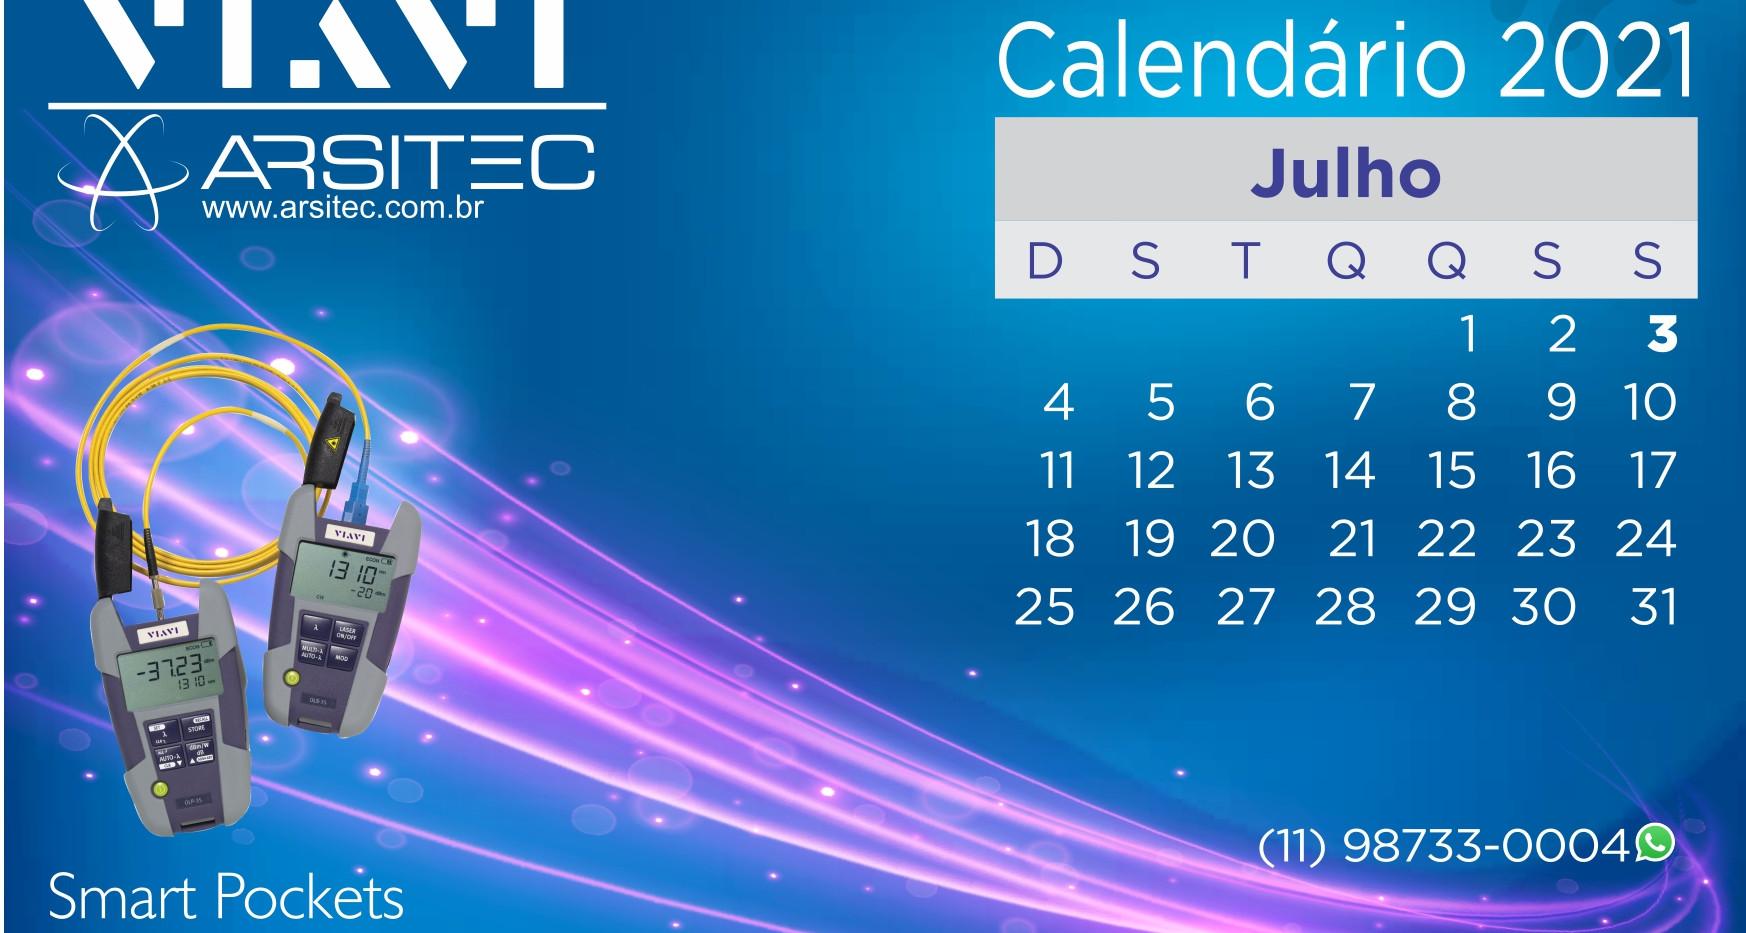 7 Julho 21.jpg